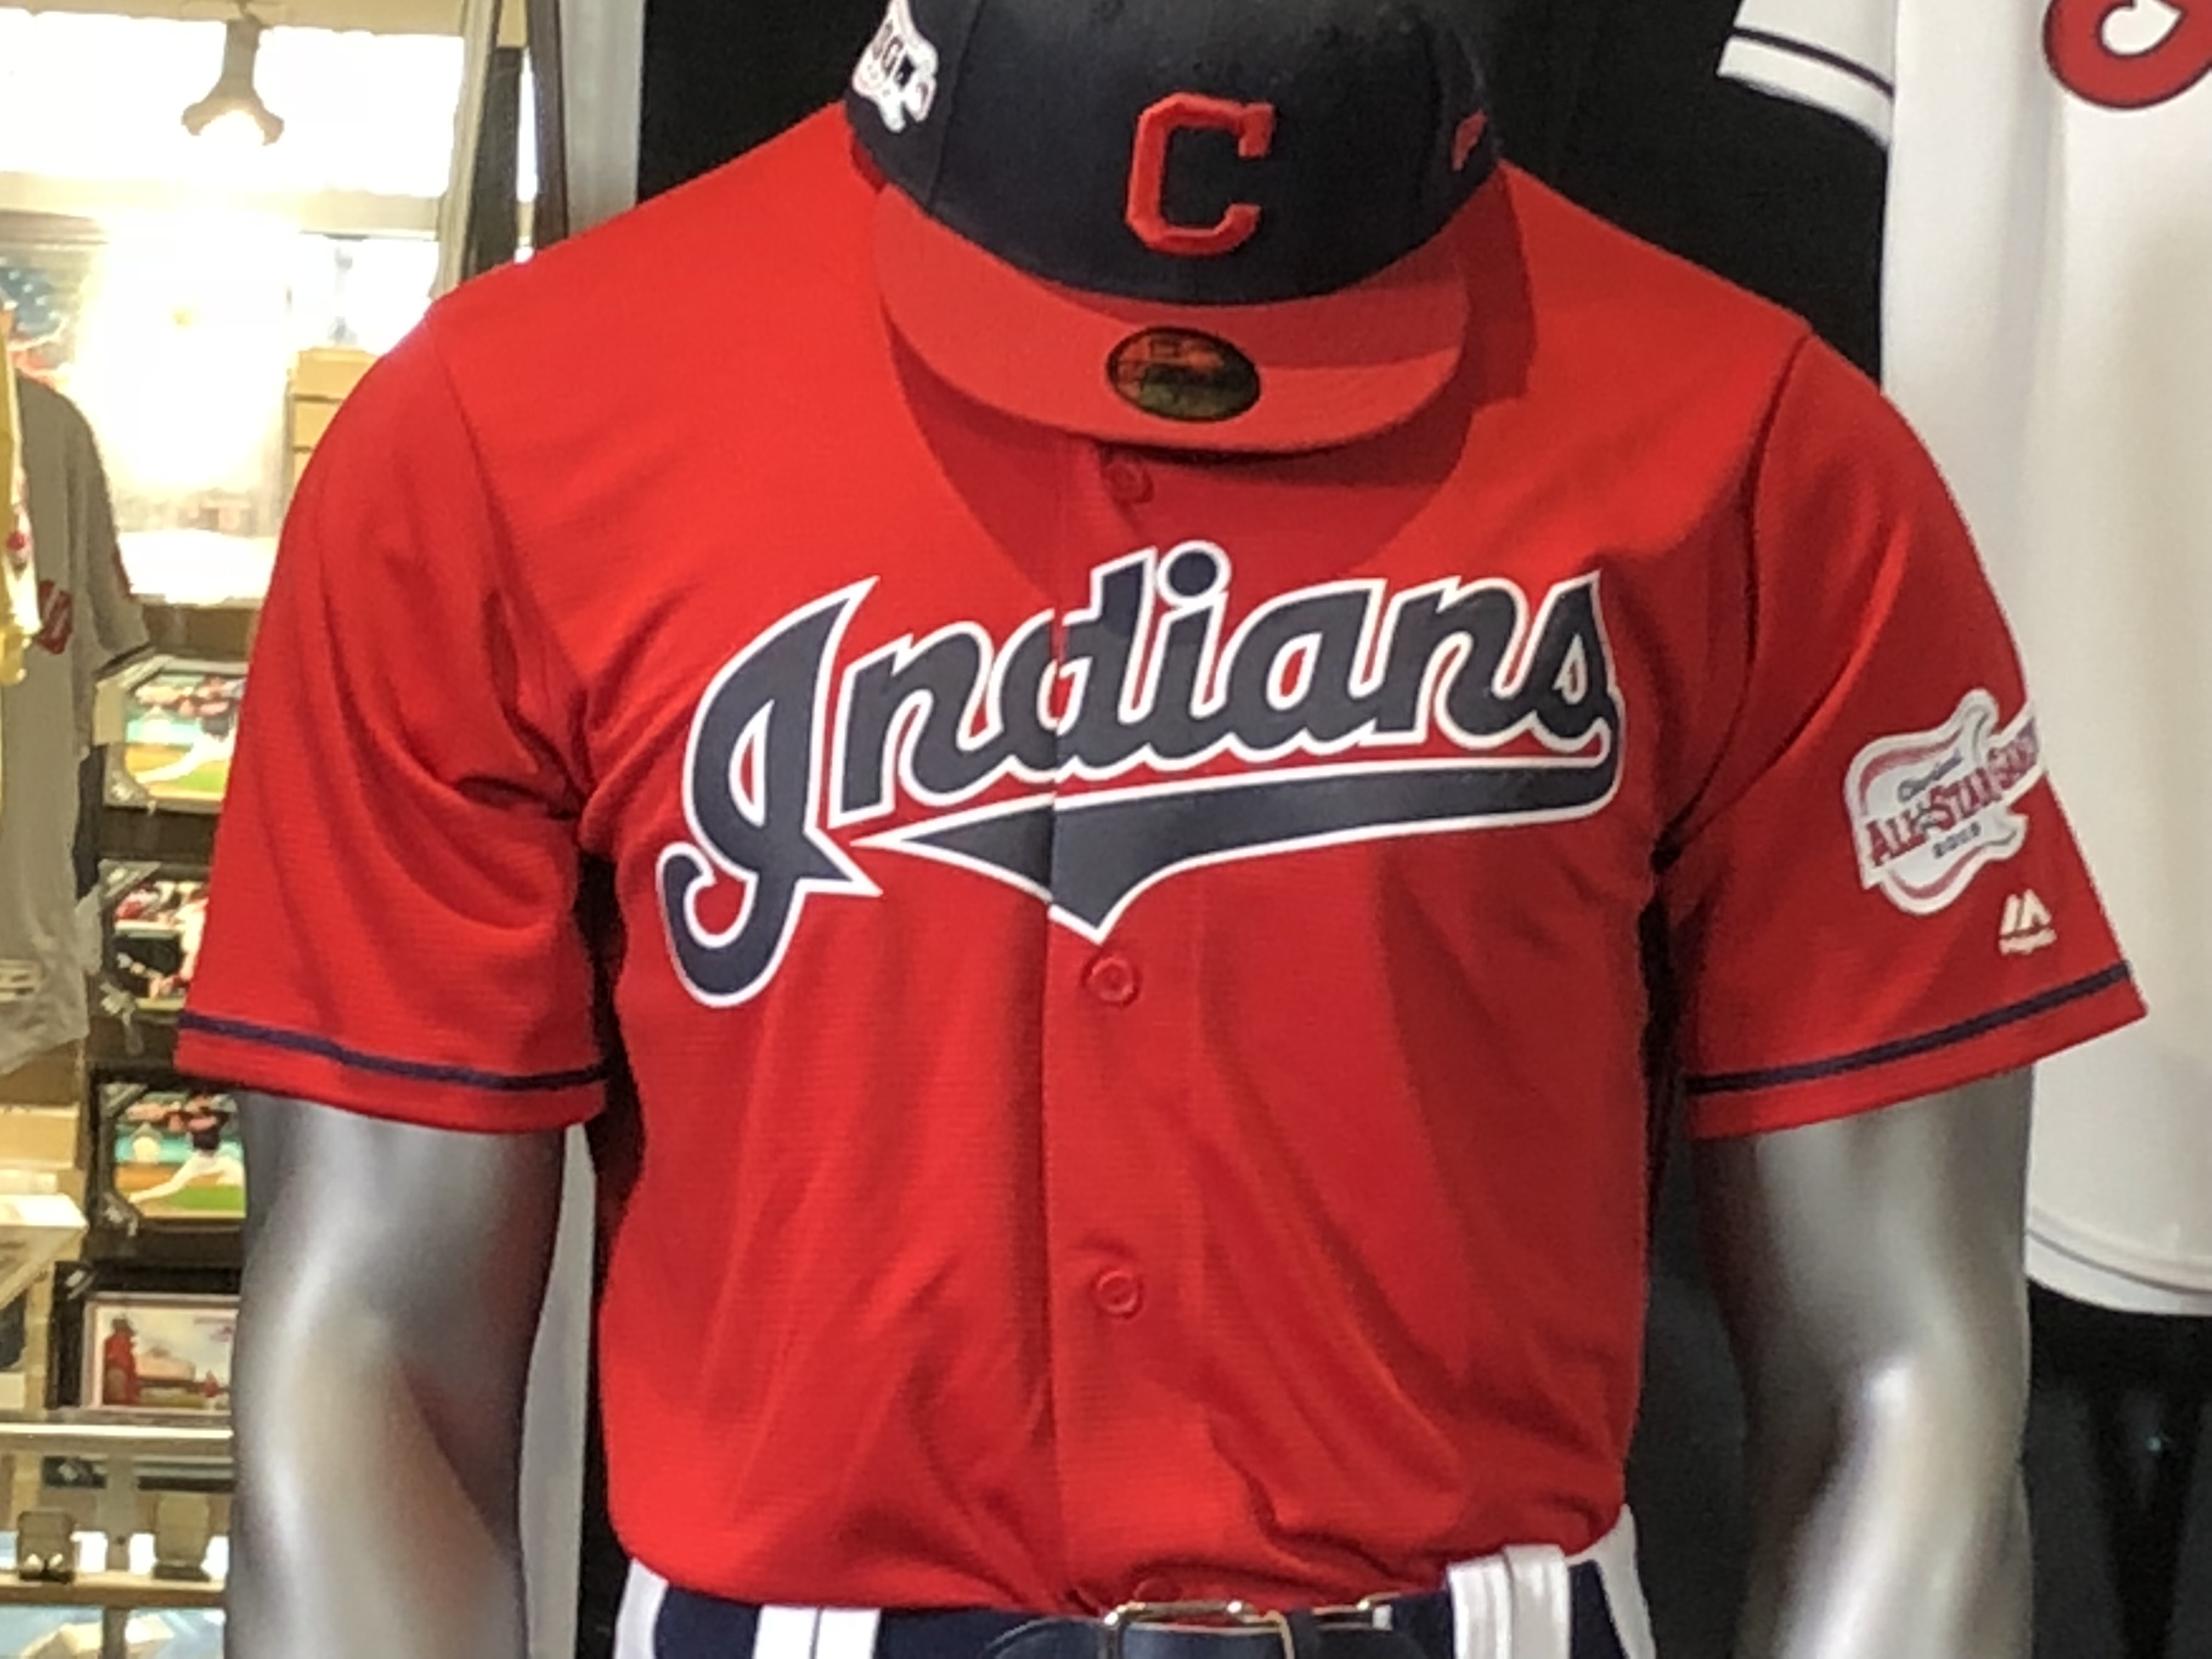 8e58941a5cc Indians Unveil New Uniforms for 2019  Show Off New Red Alternate Home  Uniform